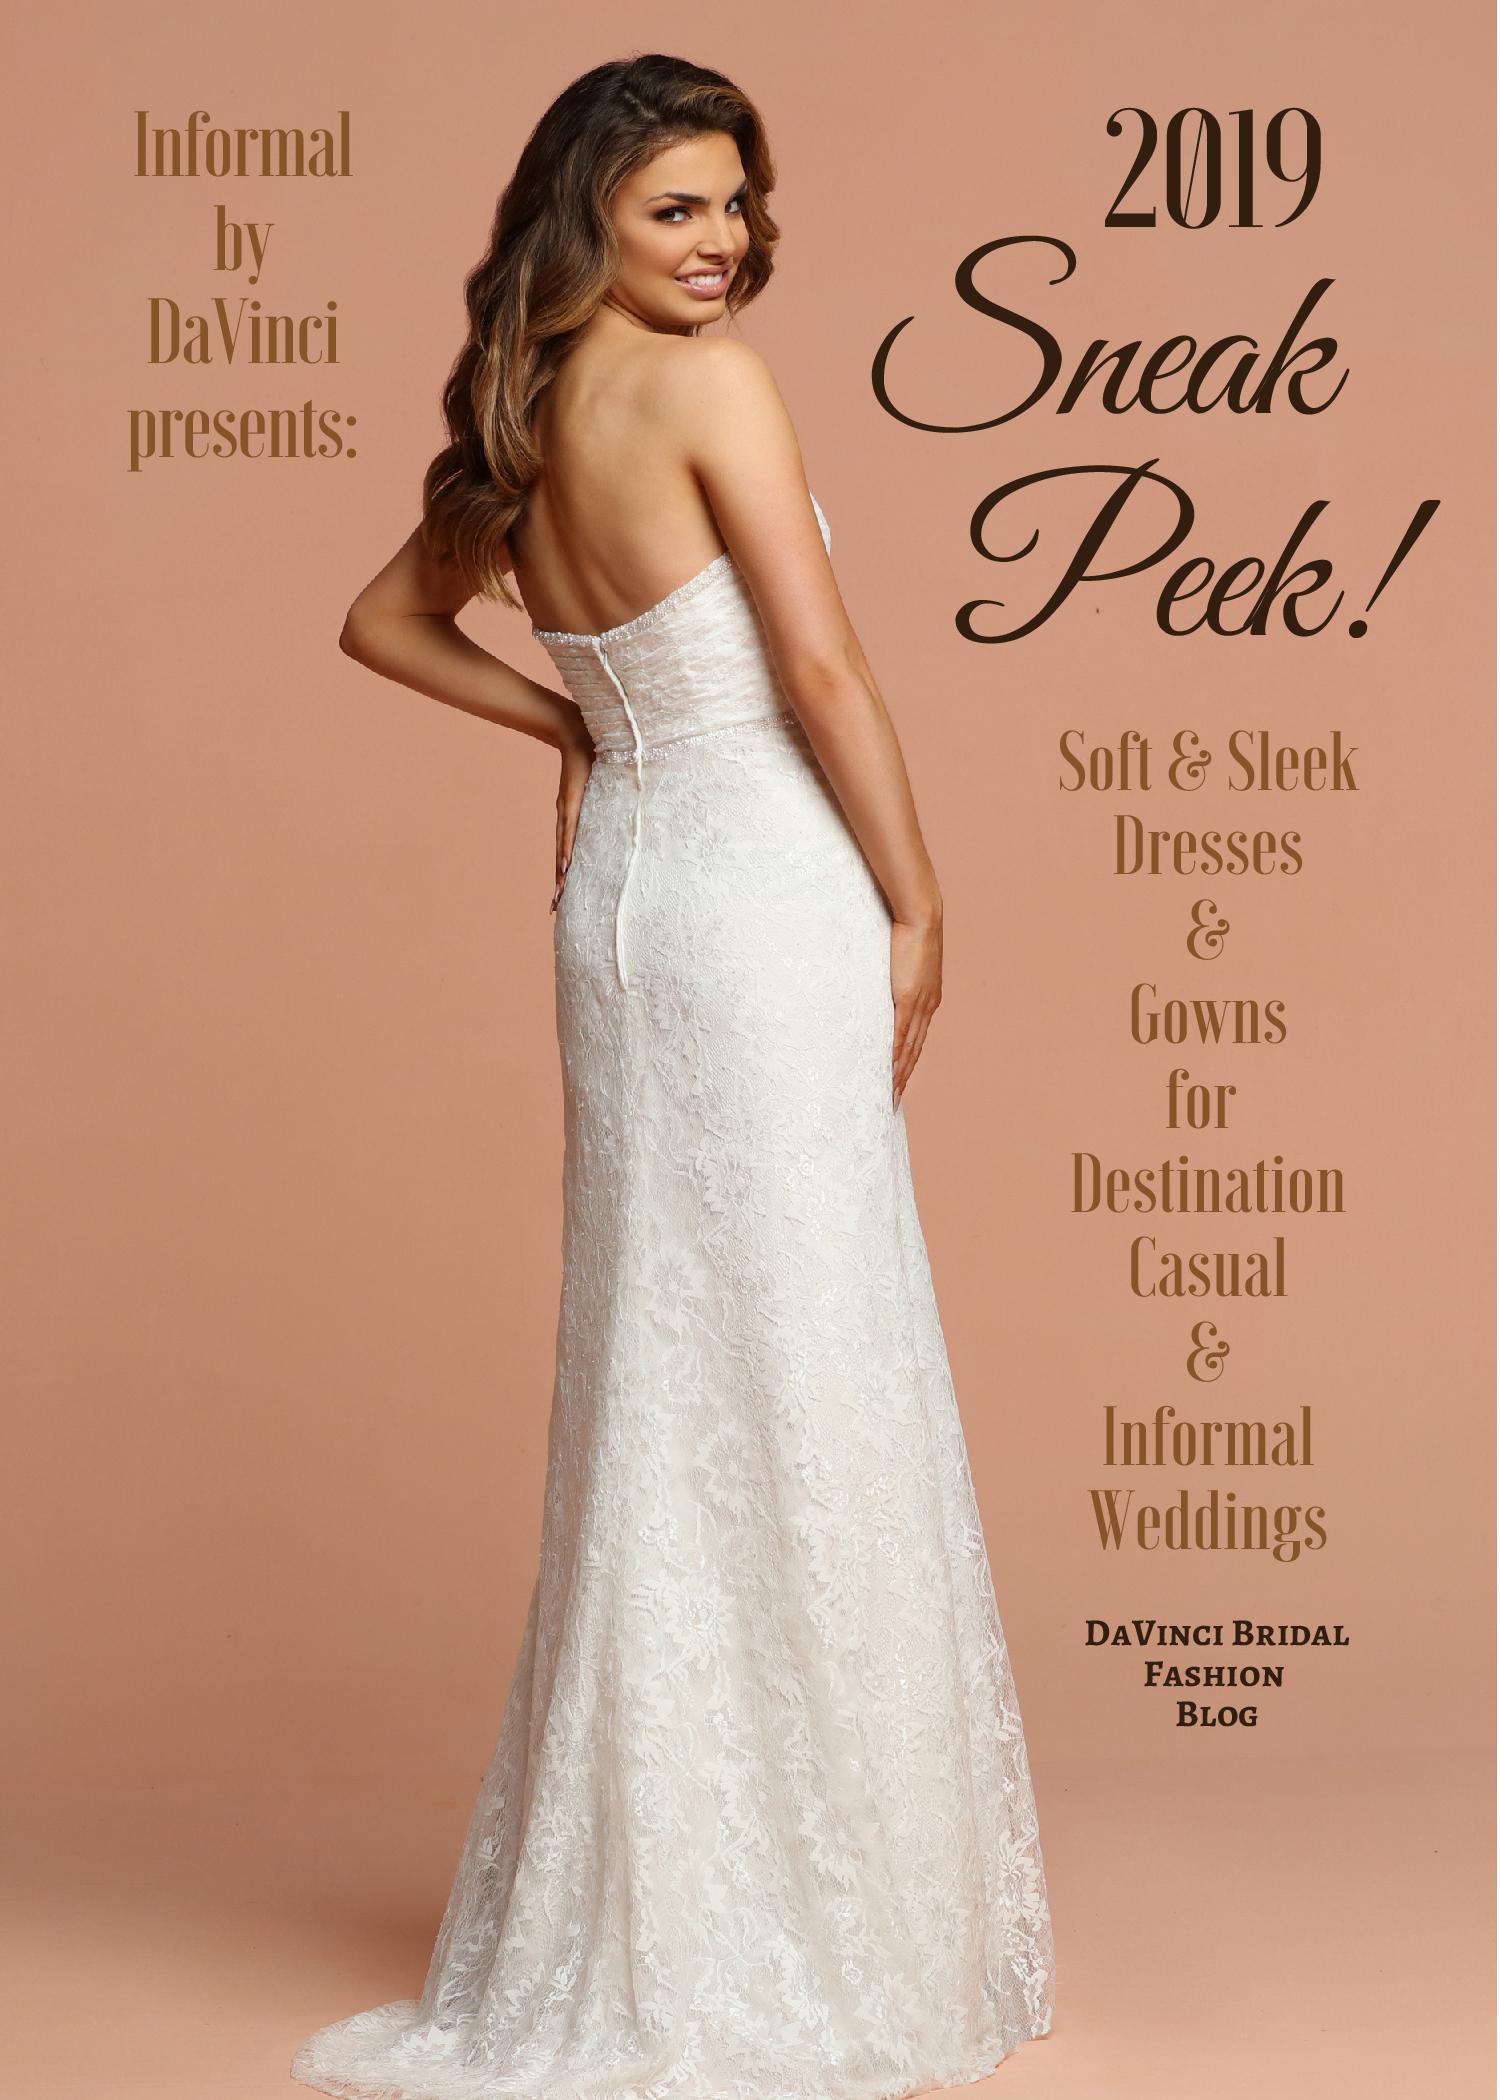 Casual Informal 2019 Wedding Dress Sneak Peek Davinci Bridal Blog